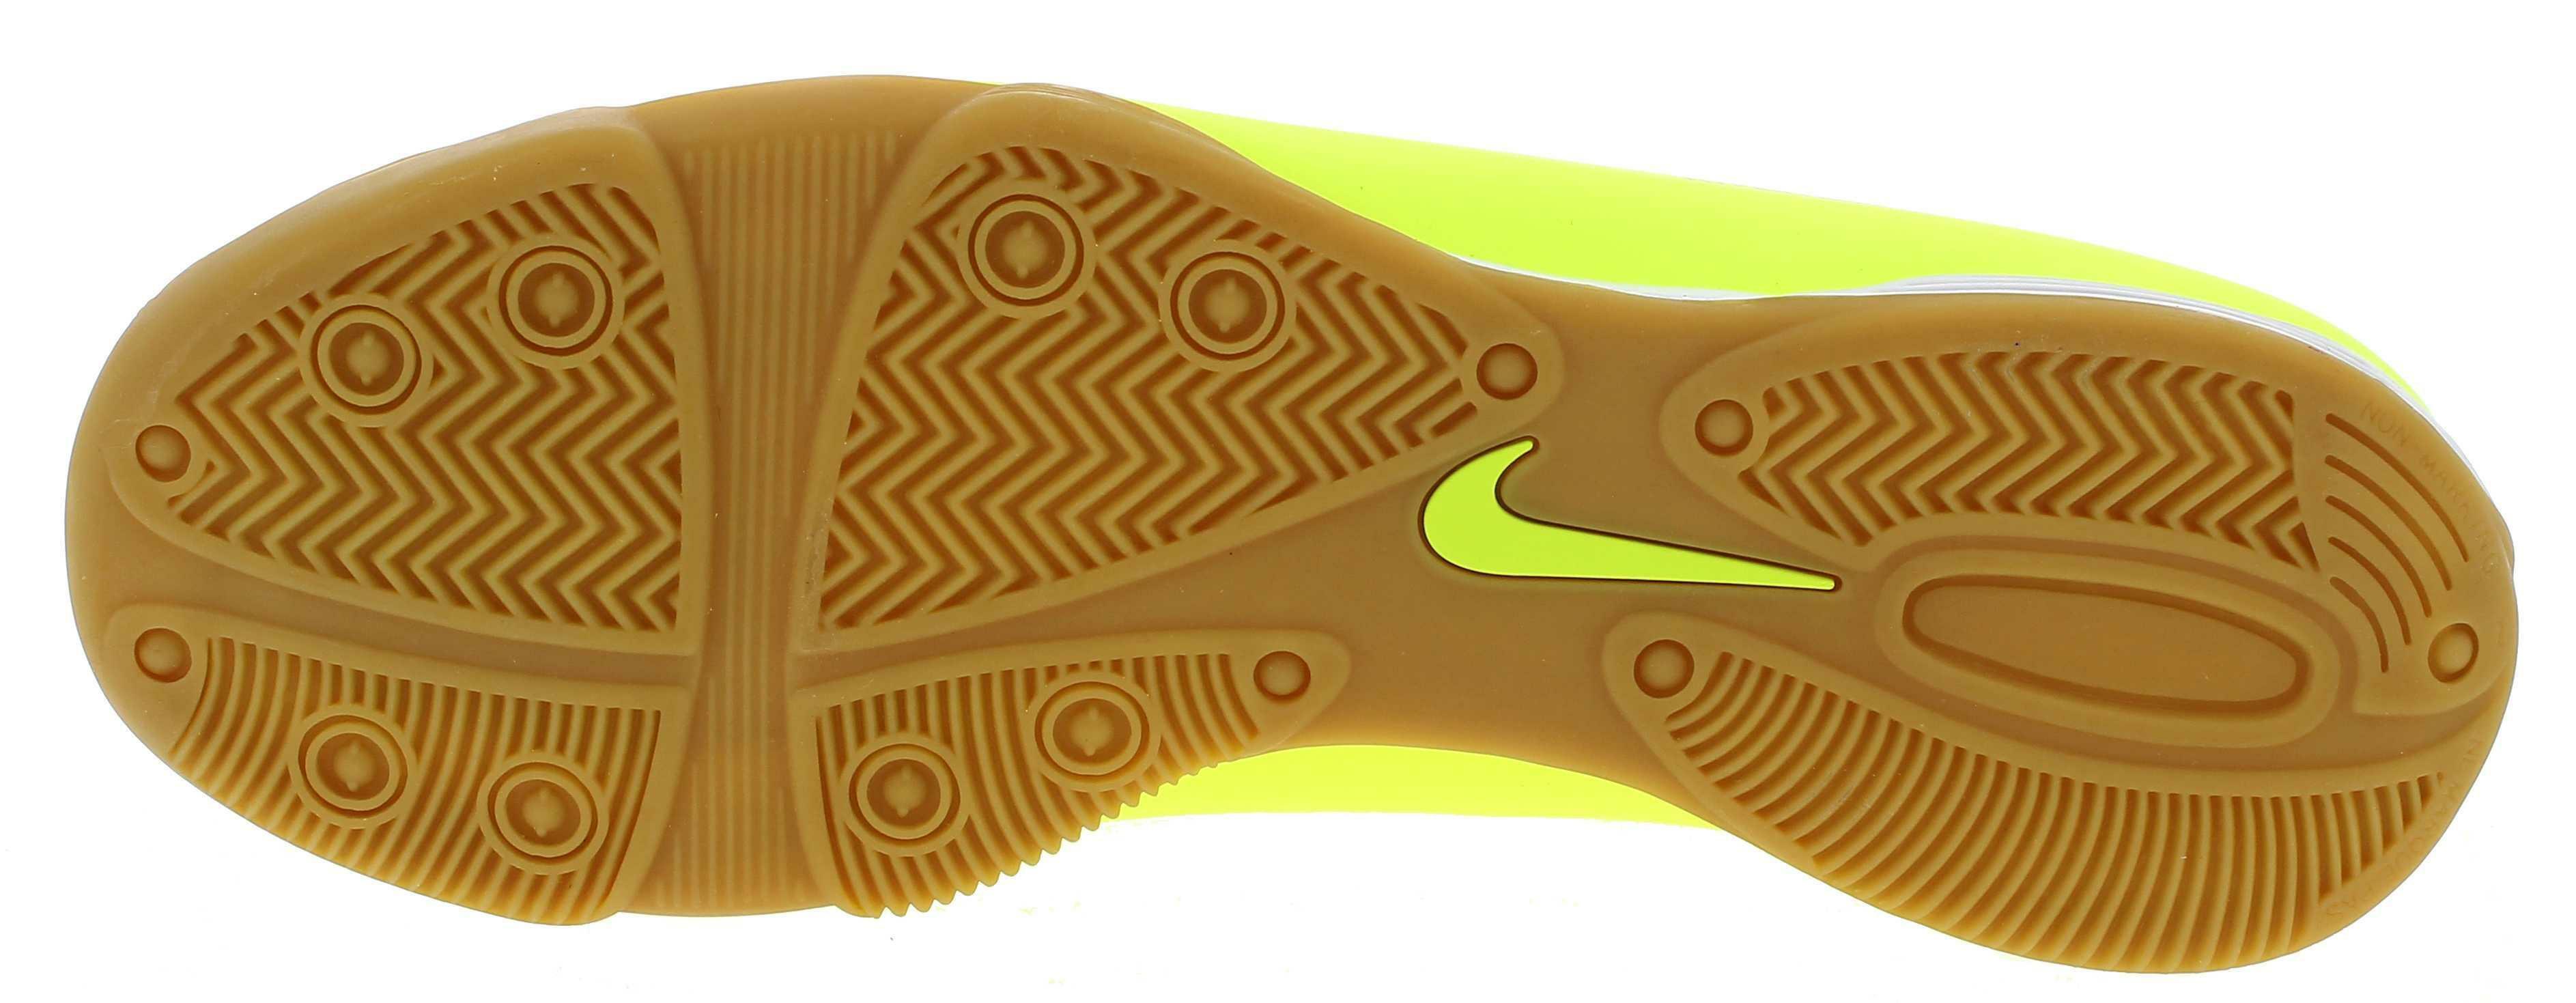 nike nike hypervenom phade ic scarpini calcetto uomo gialli pelle indoor 599810